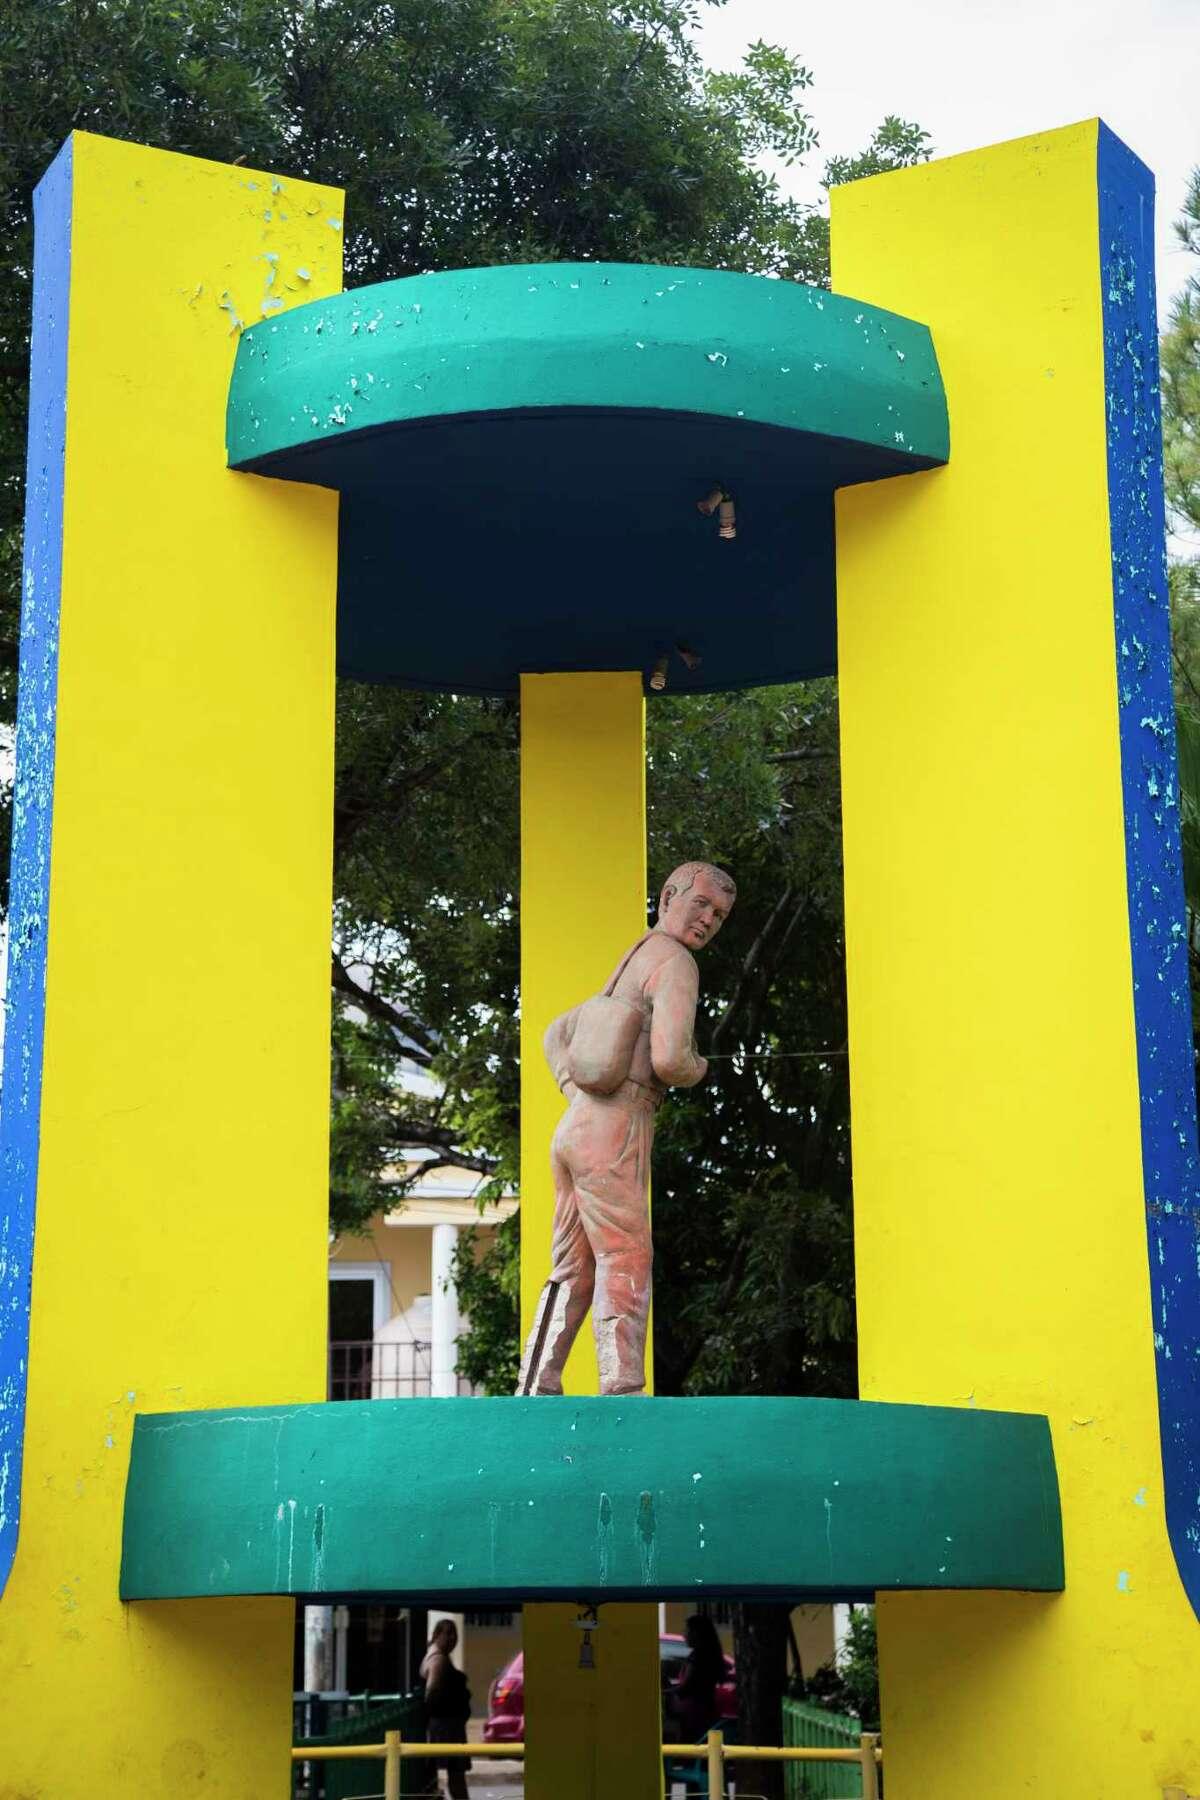 The statue of Sigfredo Ché¡vez in IntipucaÂ?'s migrantÂ?'s park, Wednesday, Sept. 27, 2017, in Intipuca, El Salvador. ( Marie D. De Jesus / Houston Chronicle )